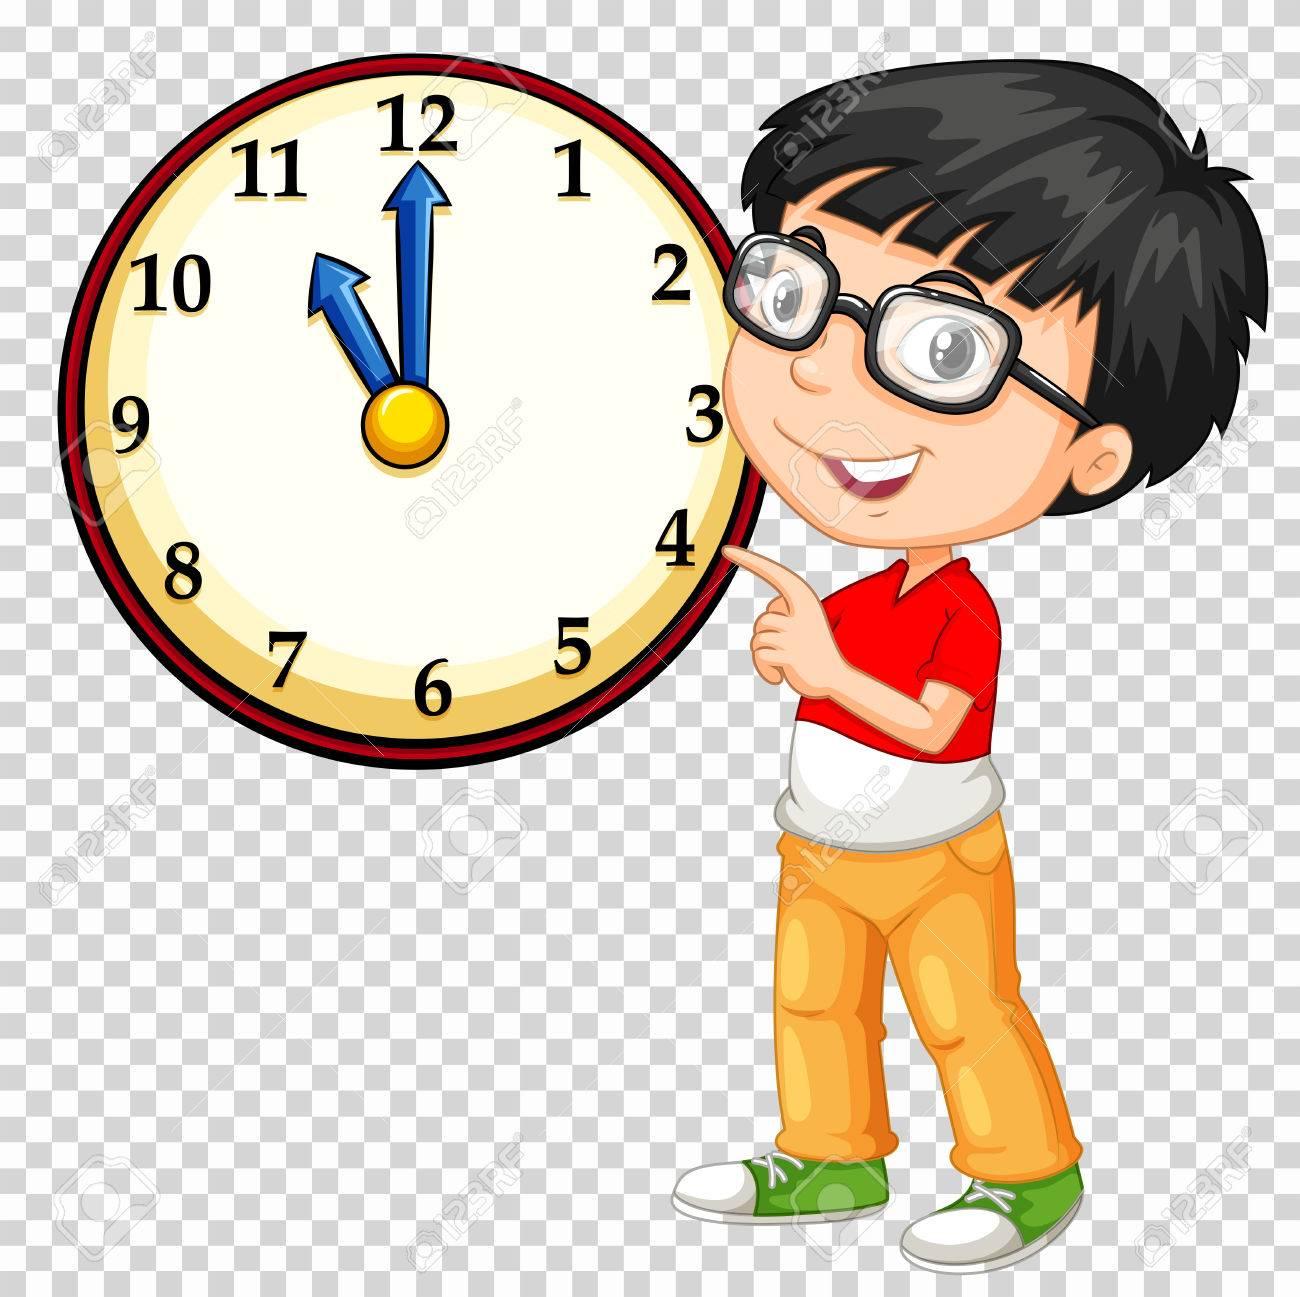 Boy looking at clock on transparent background illustration - 78000085